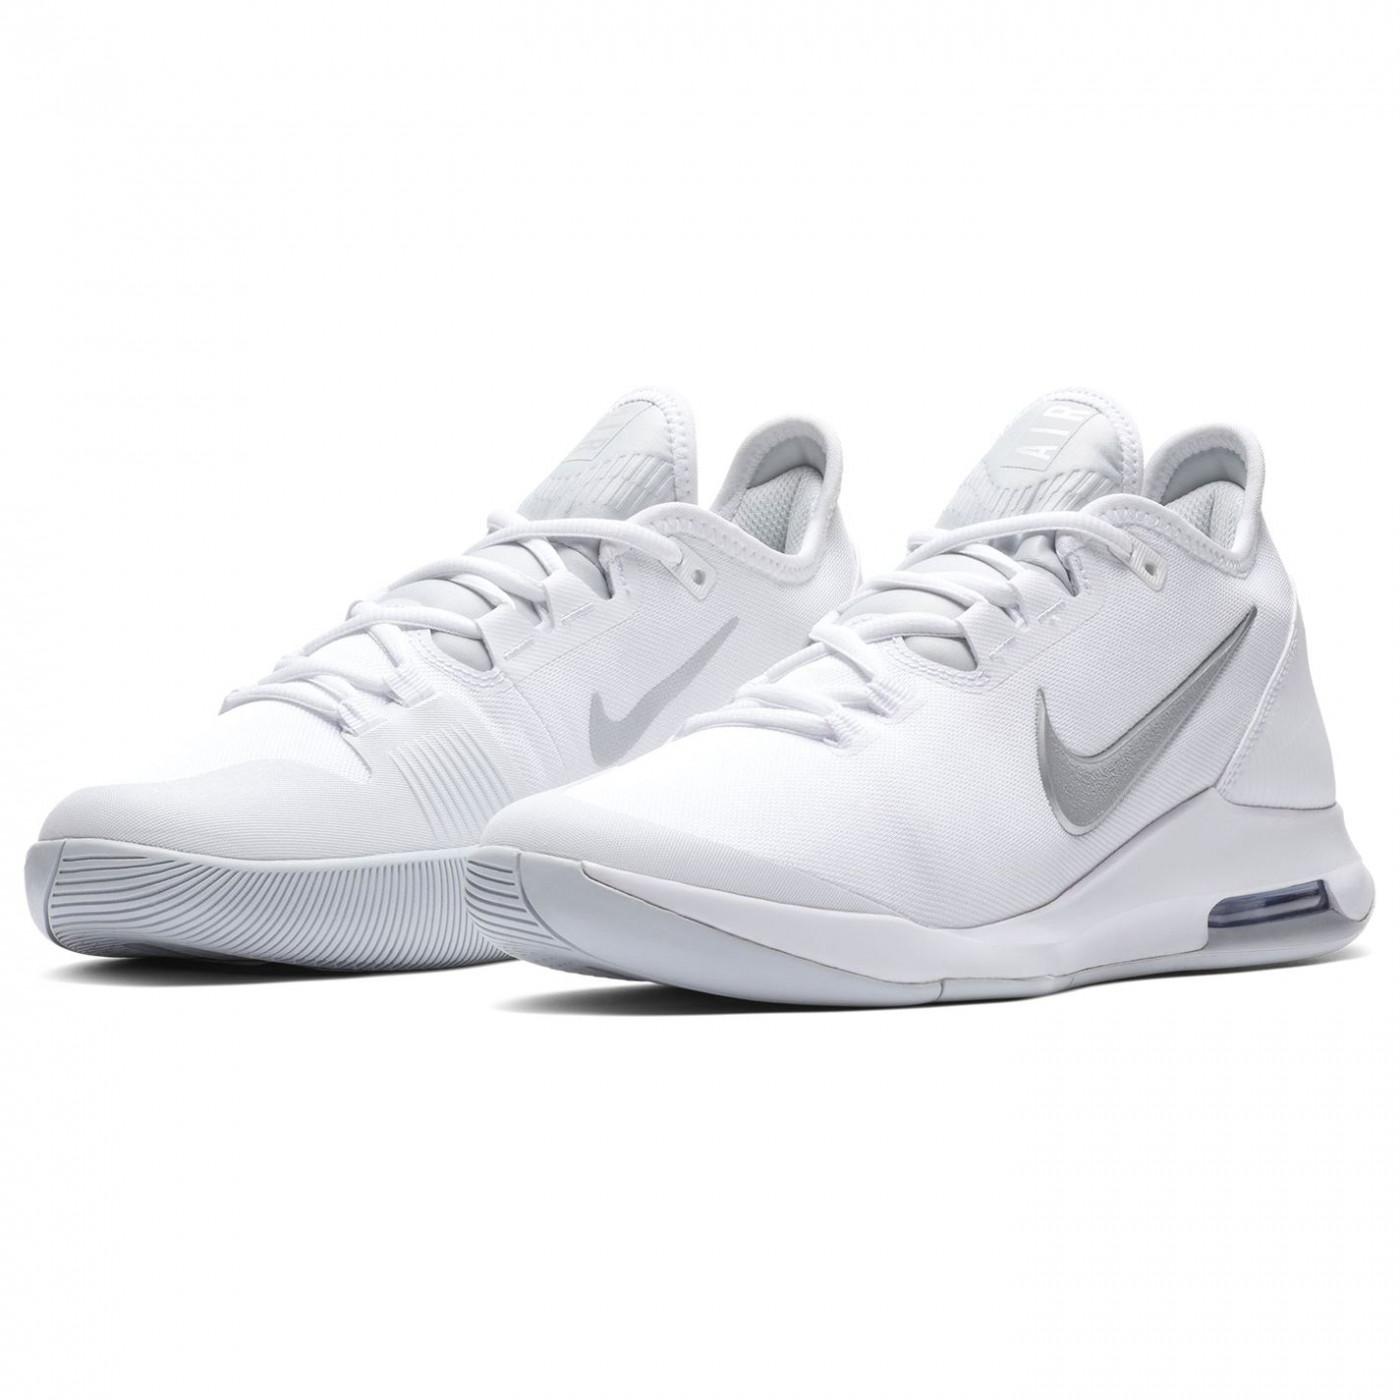 Nike Air Max Wildcard Ladies Tennis Shoes